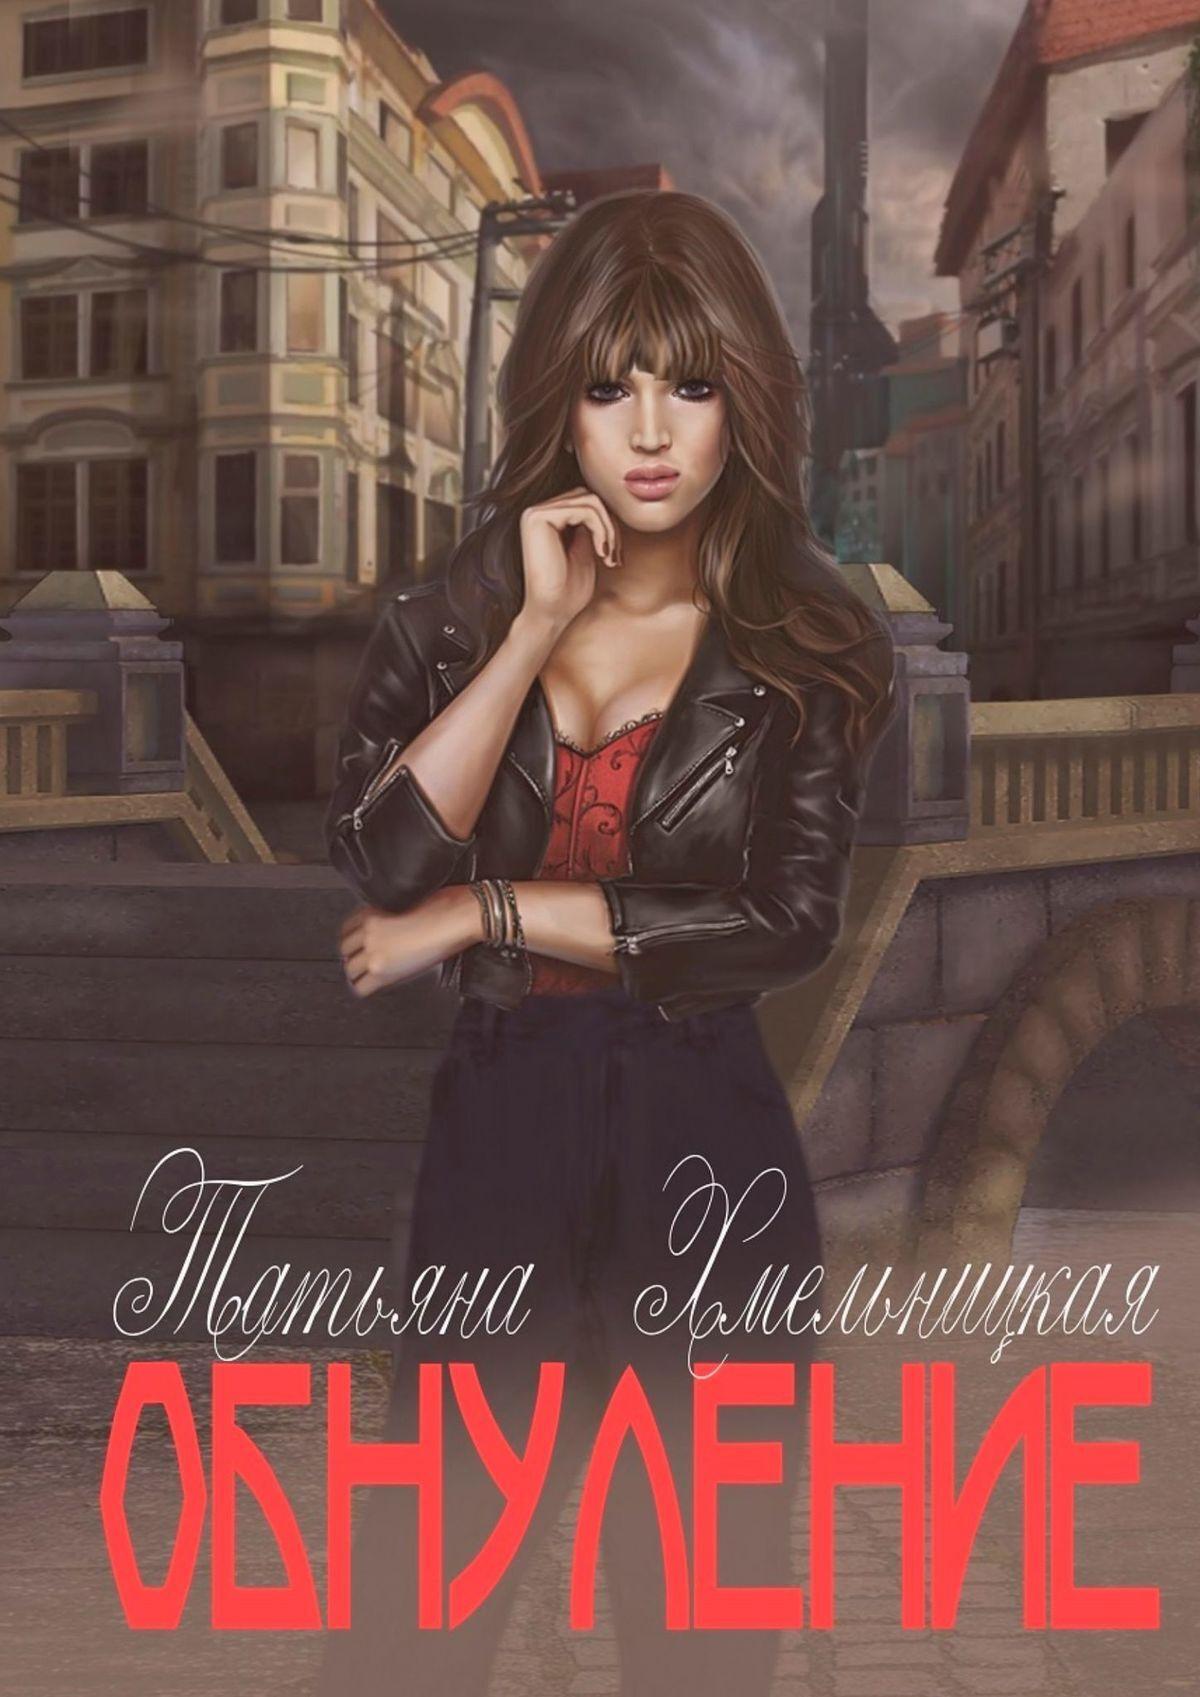 Татьяна Хмельницкая Обнуление татьяна хмельницкая агент